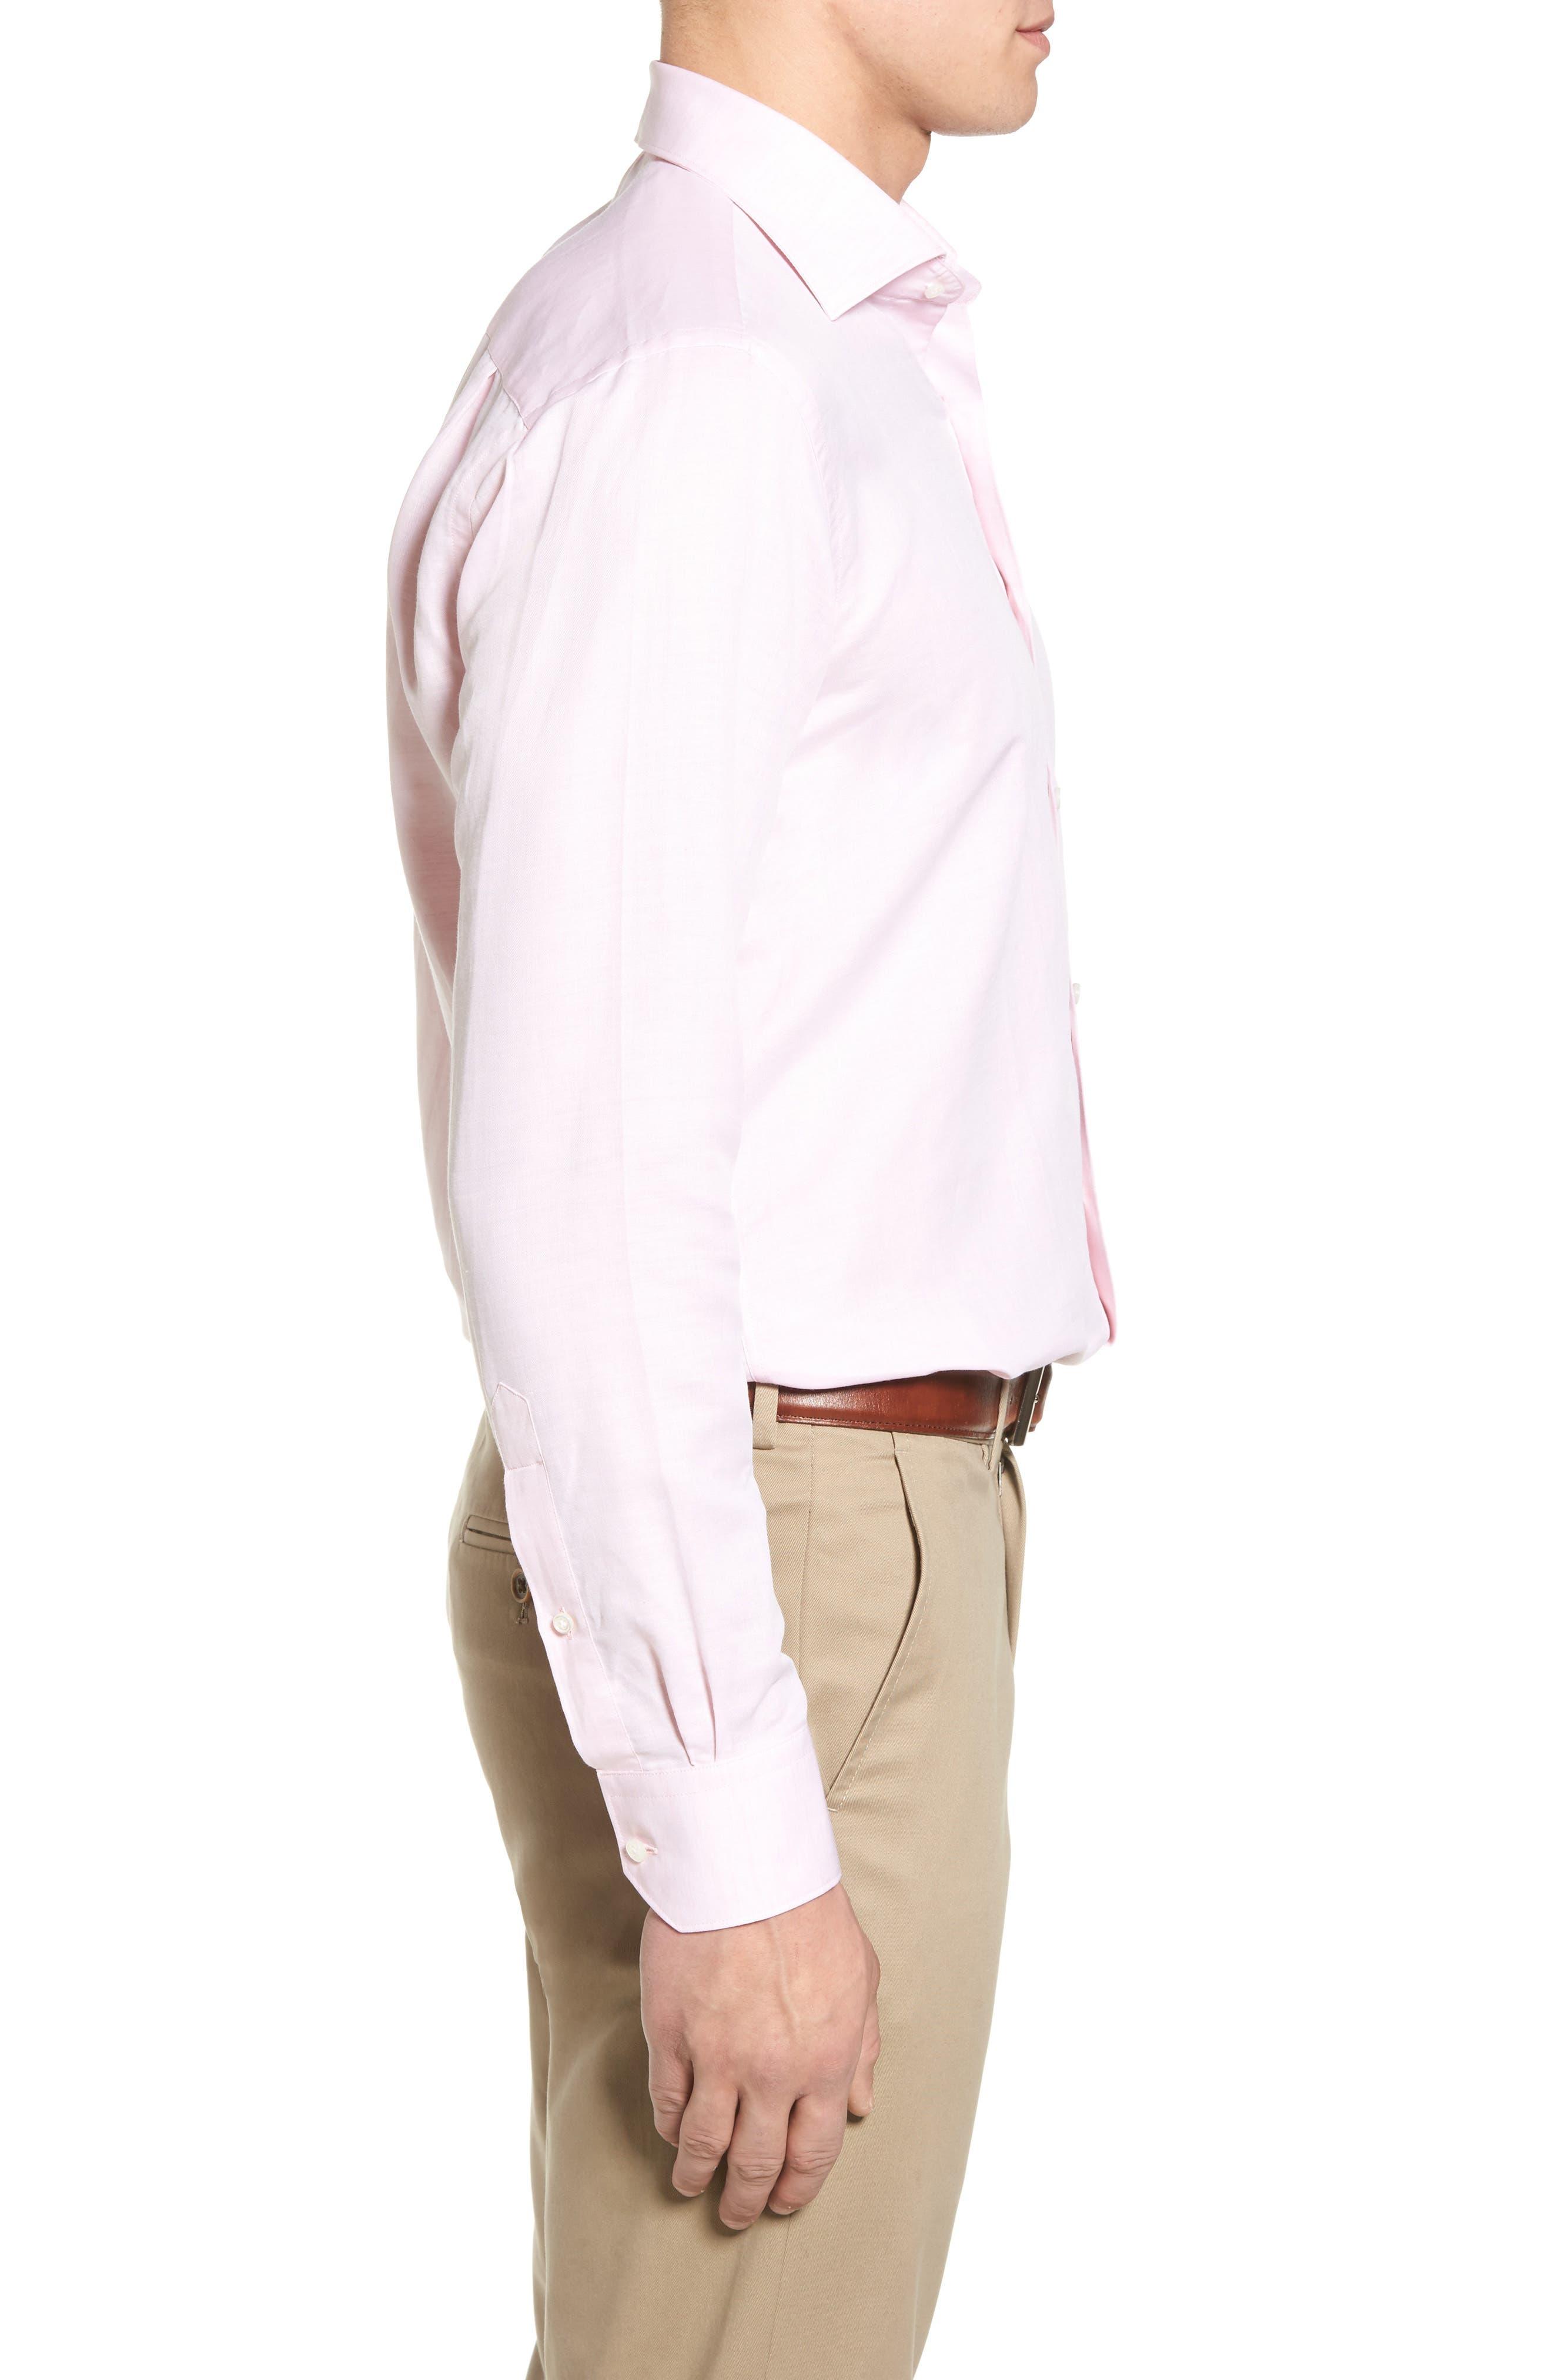 PETER MILLAR COLLECTION,                             Linen & Cotton Sport Shirt,                             Alternate thumbnail 3, color,                             626